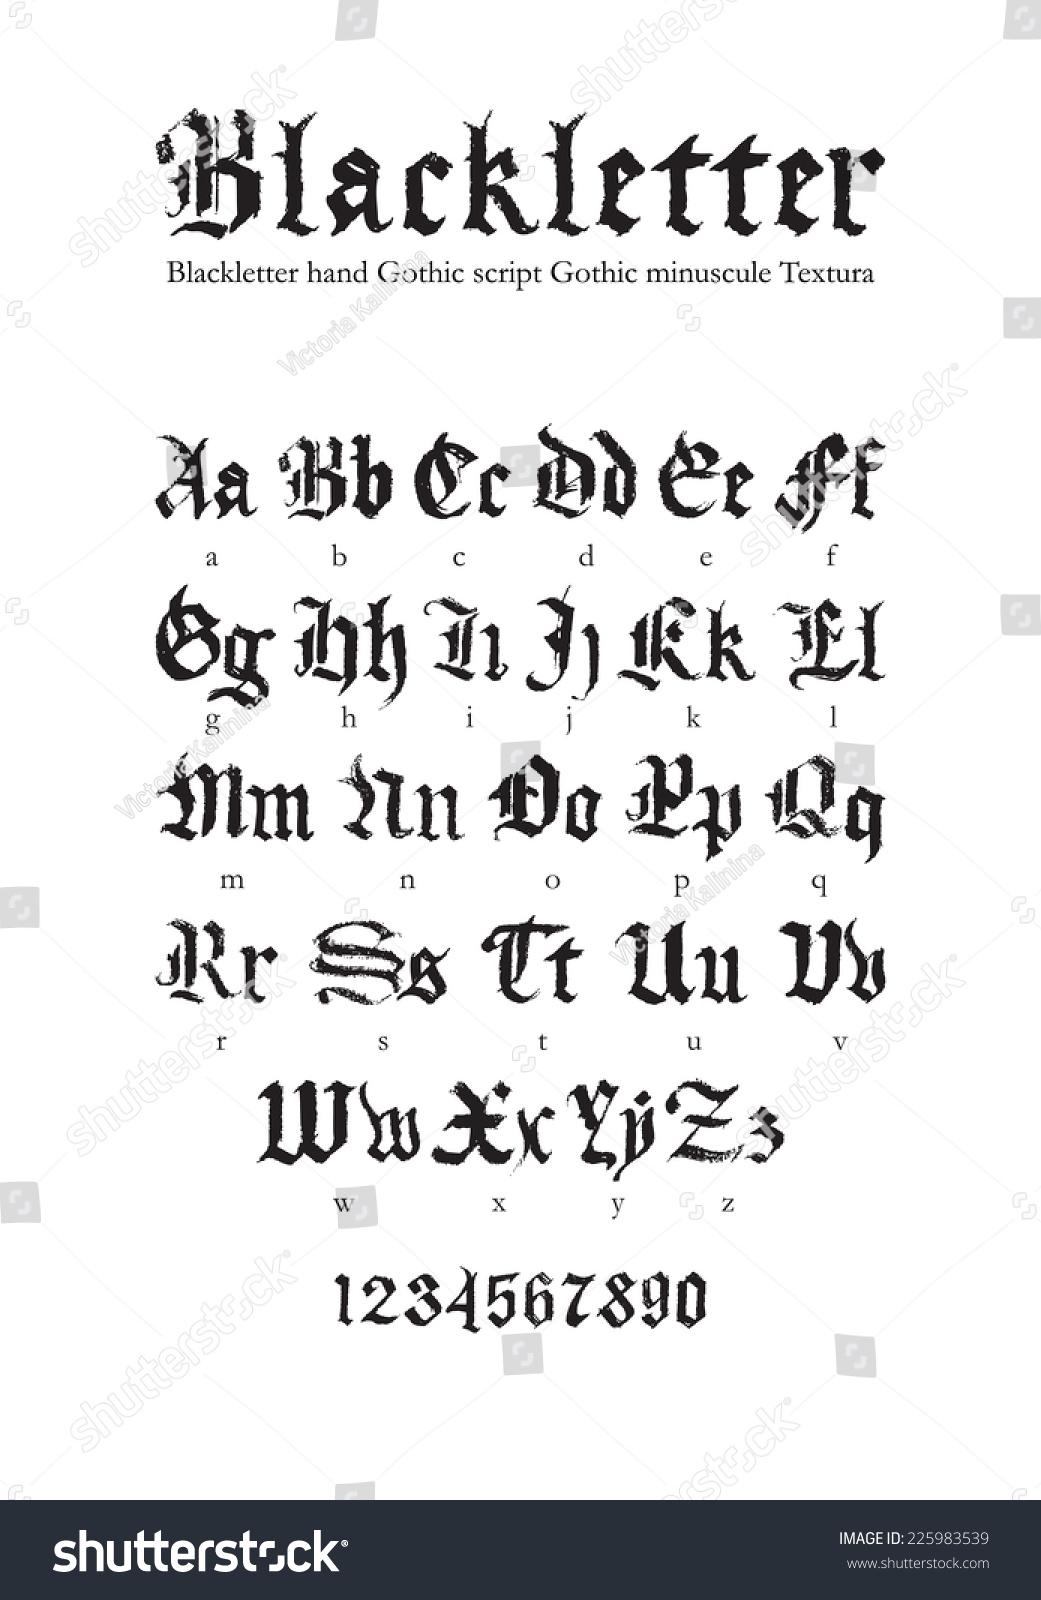 Blackletter Gothic Script Handdrawn Font Stock Vector